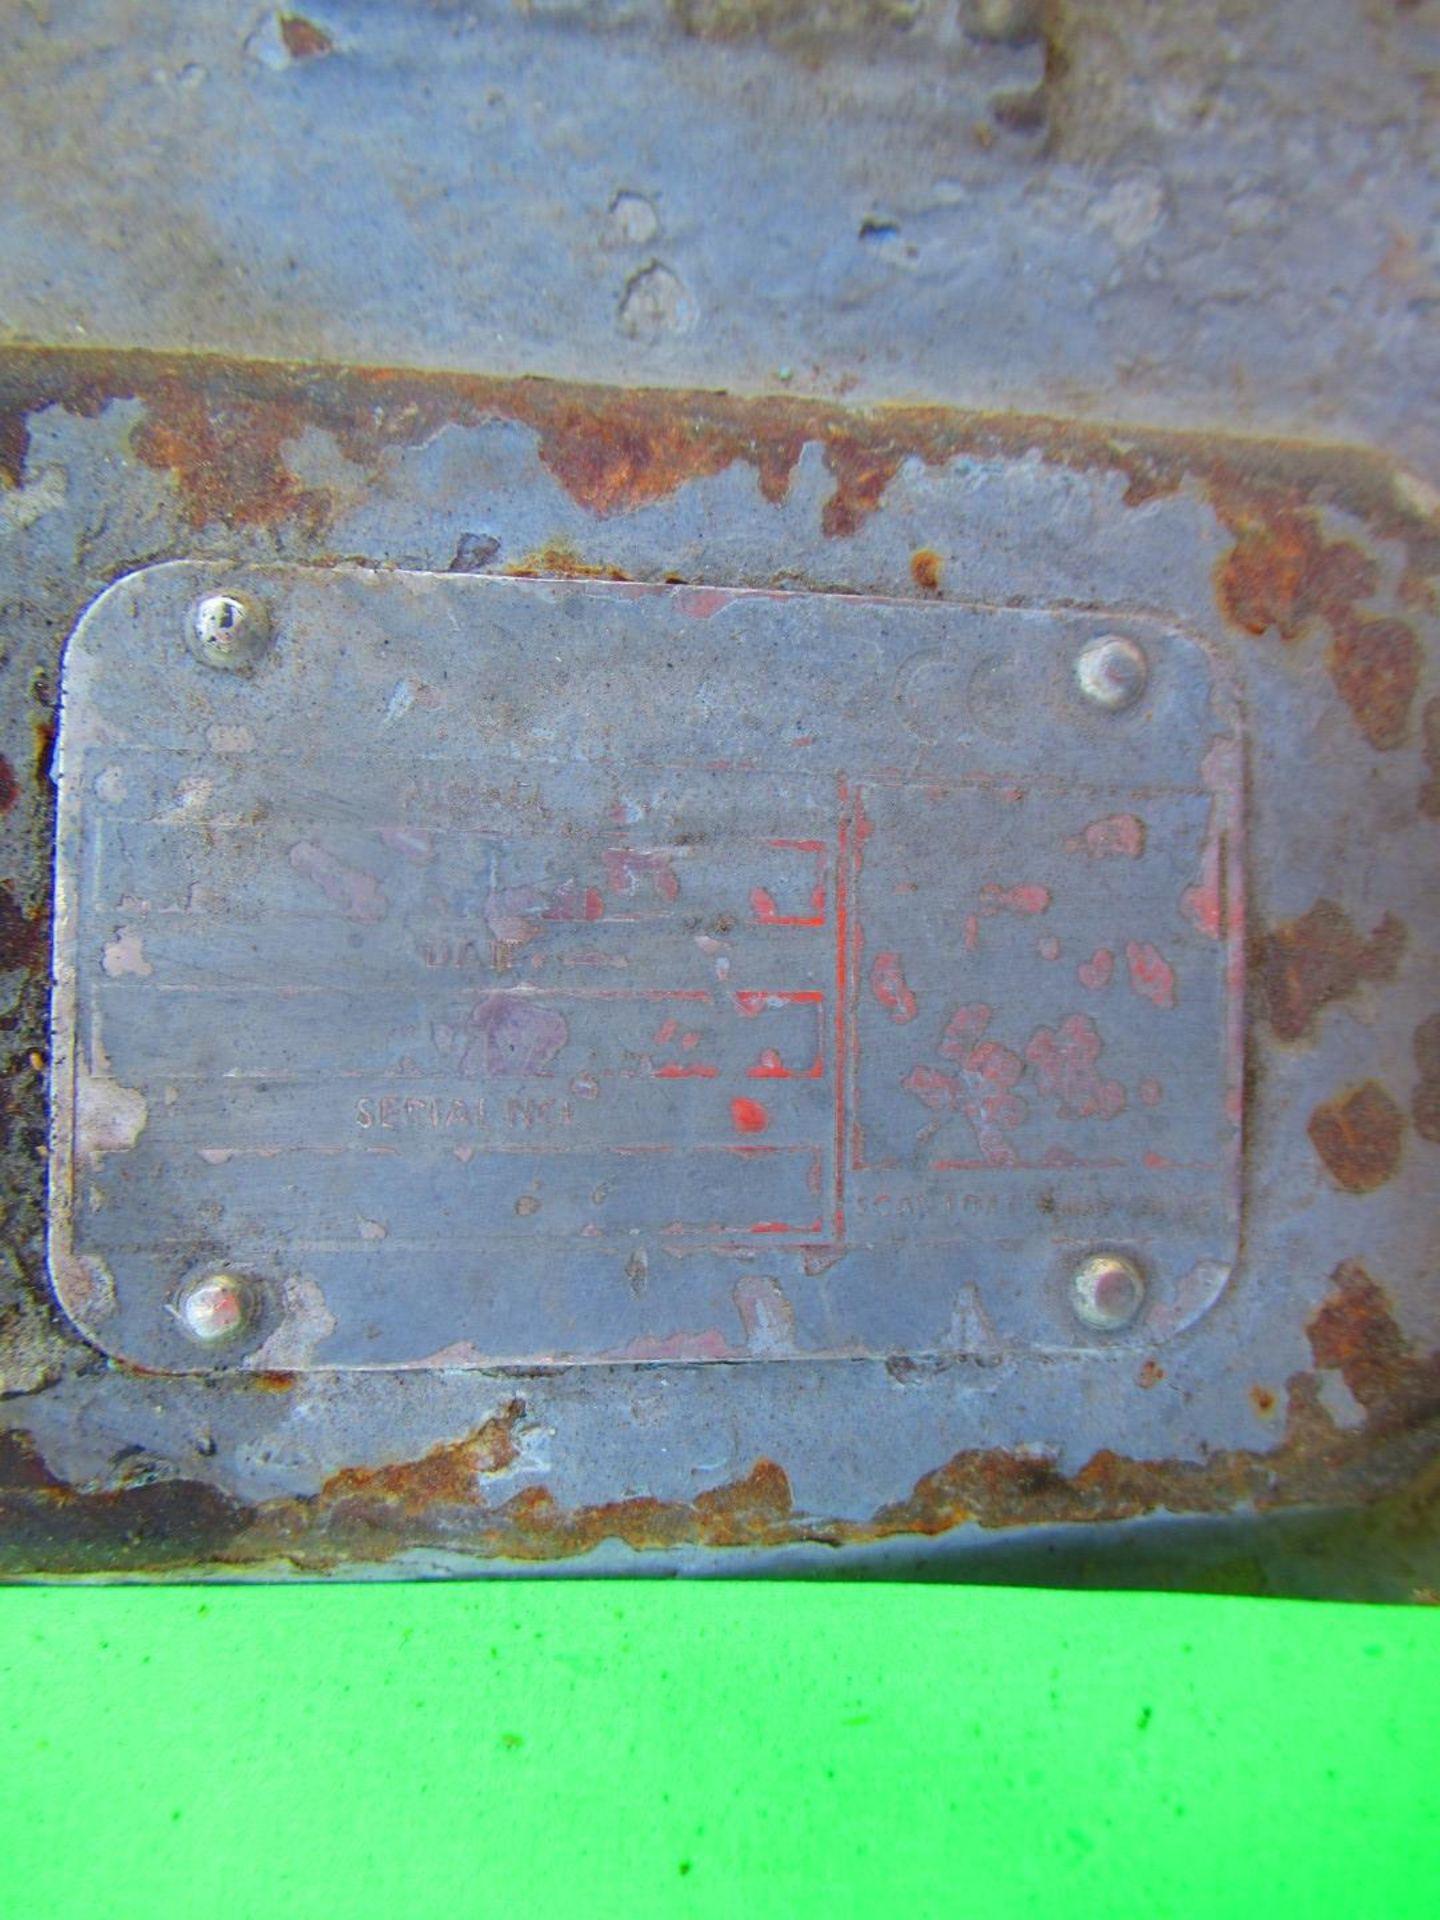 PD Pump - Image 3 of 3